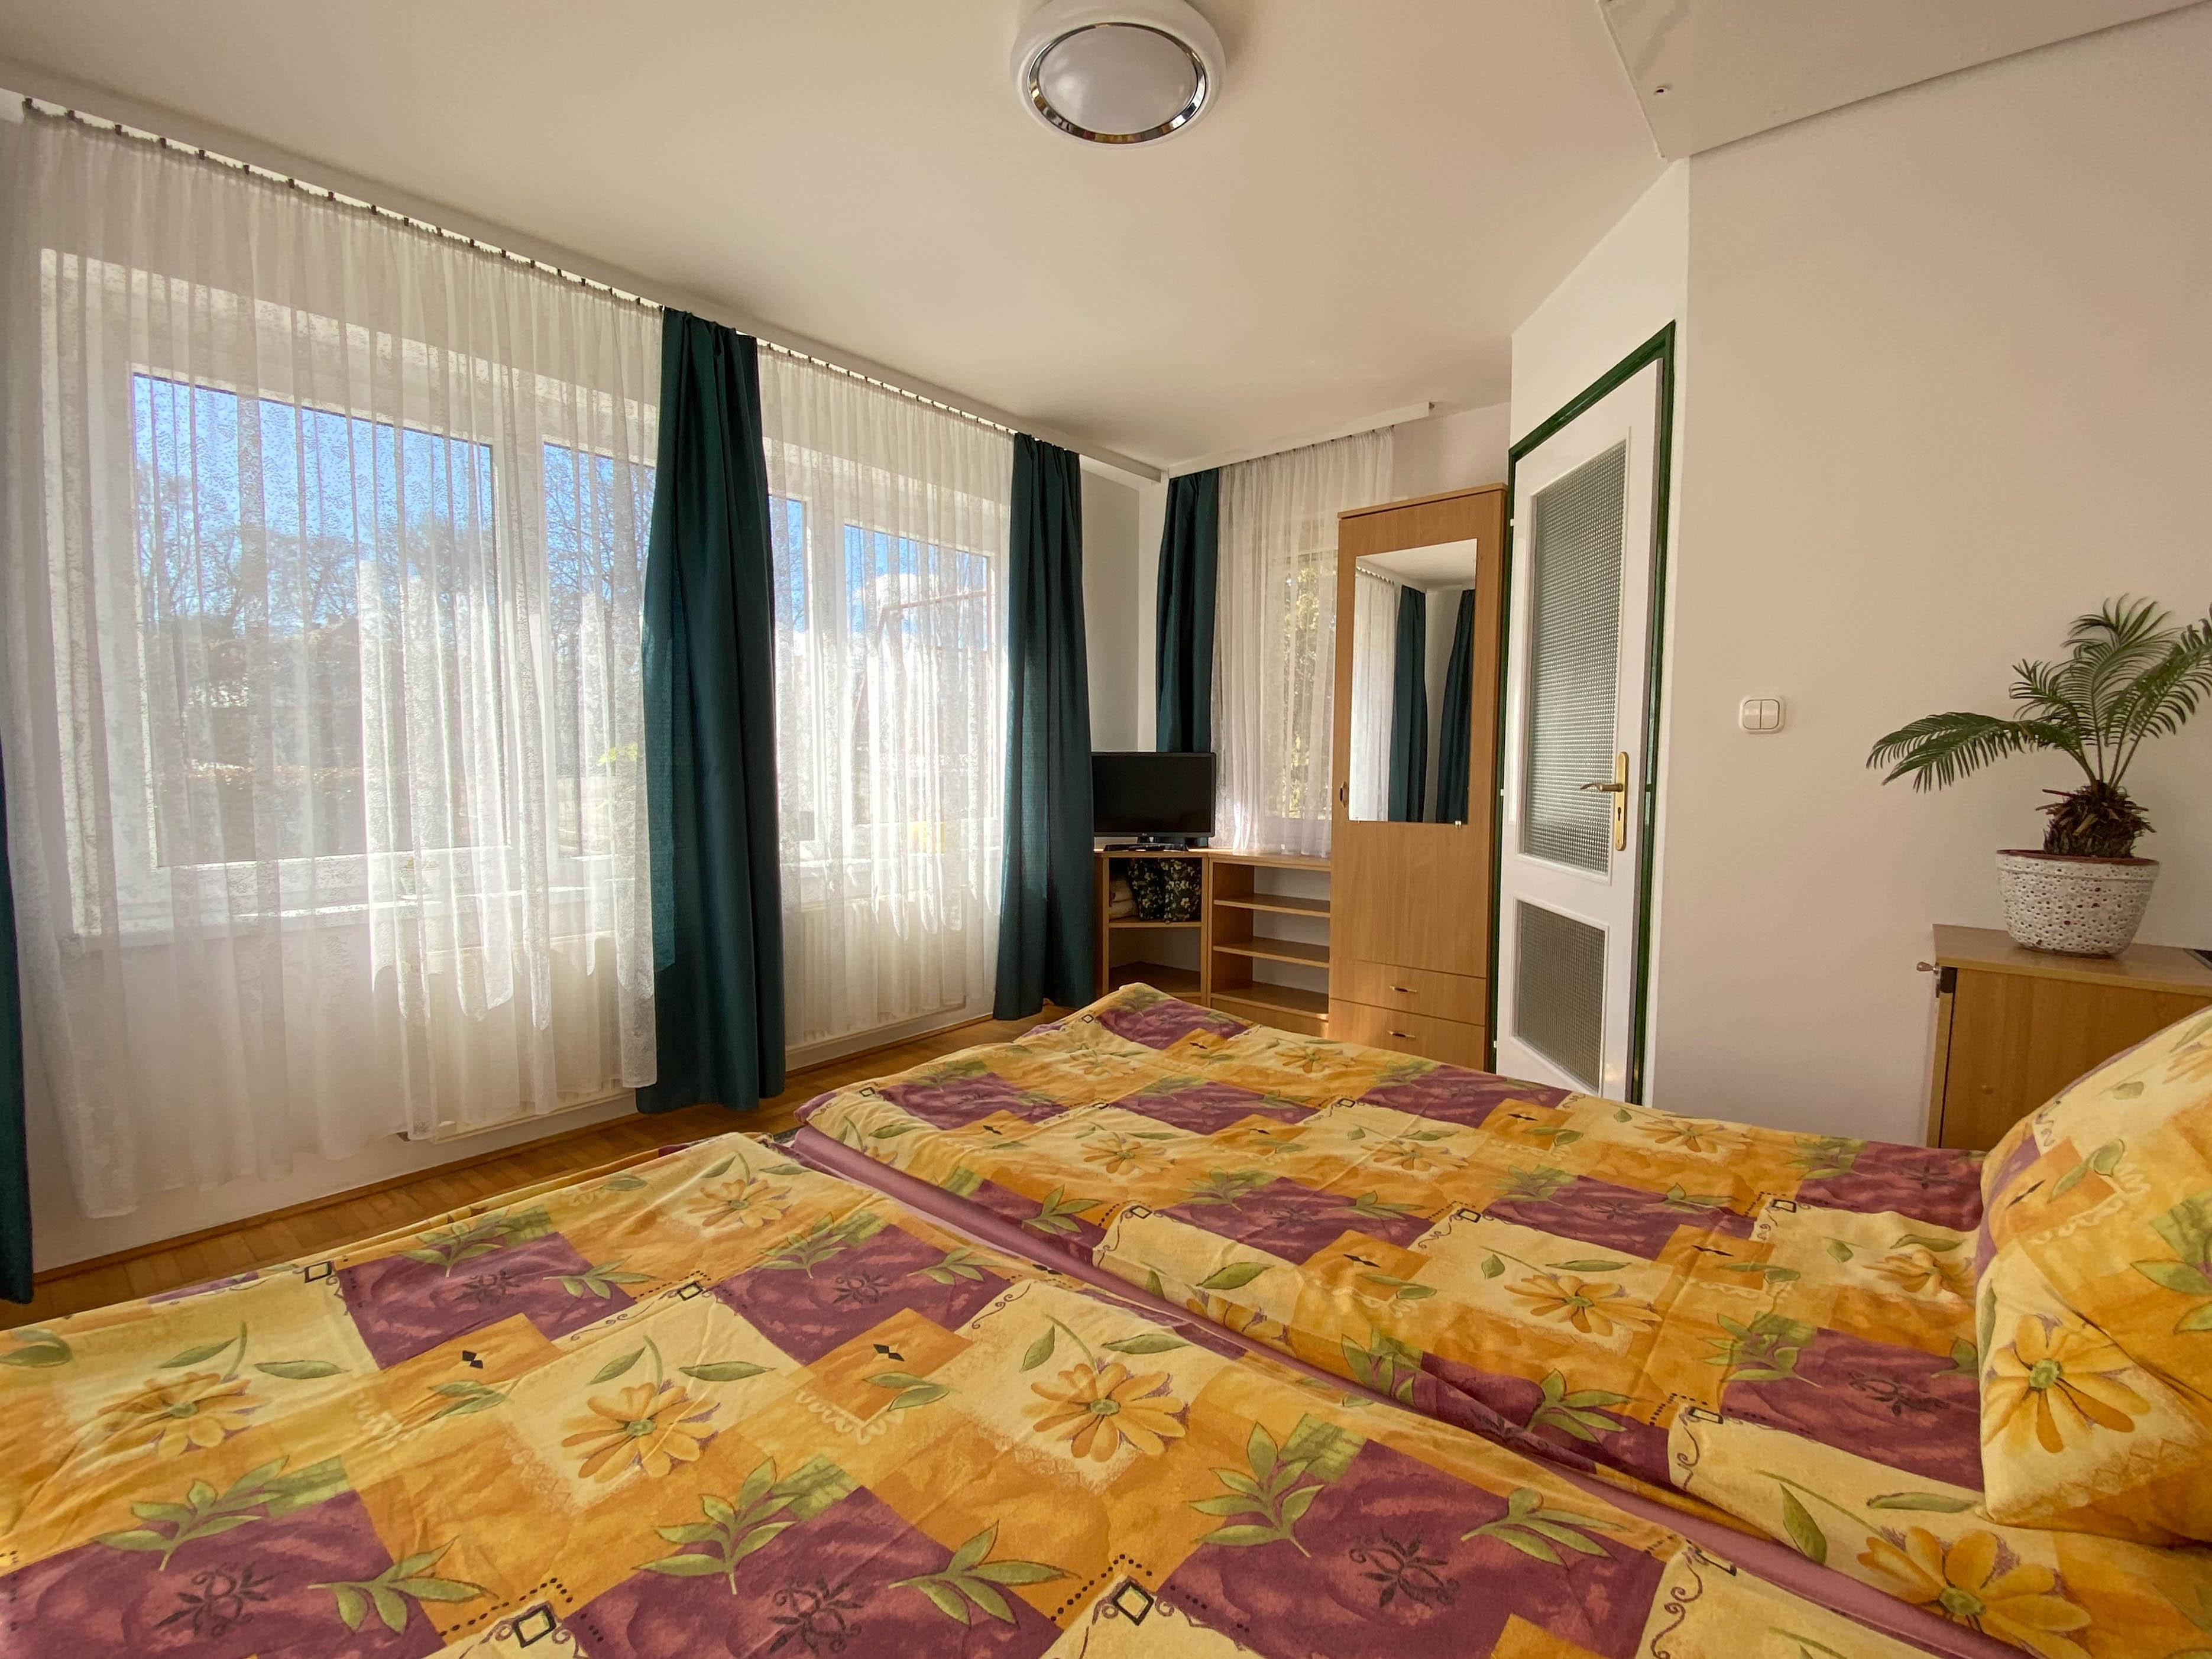 Kirandulastervezo-Sarospatak-Iskolakert-Apartman-6.jpg